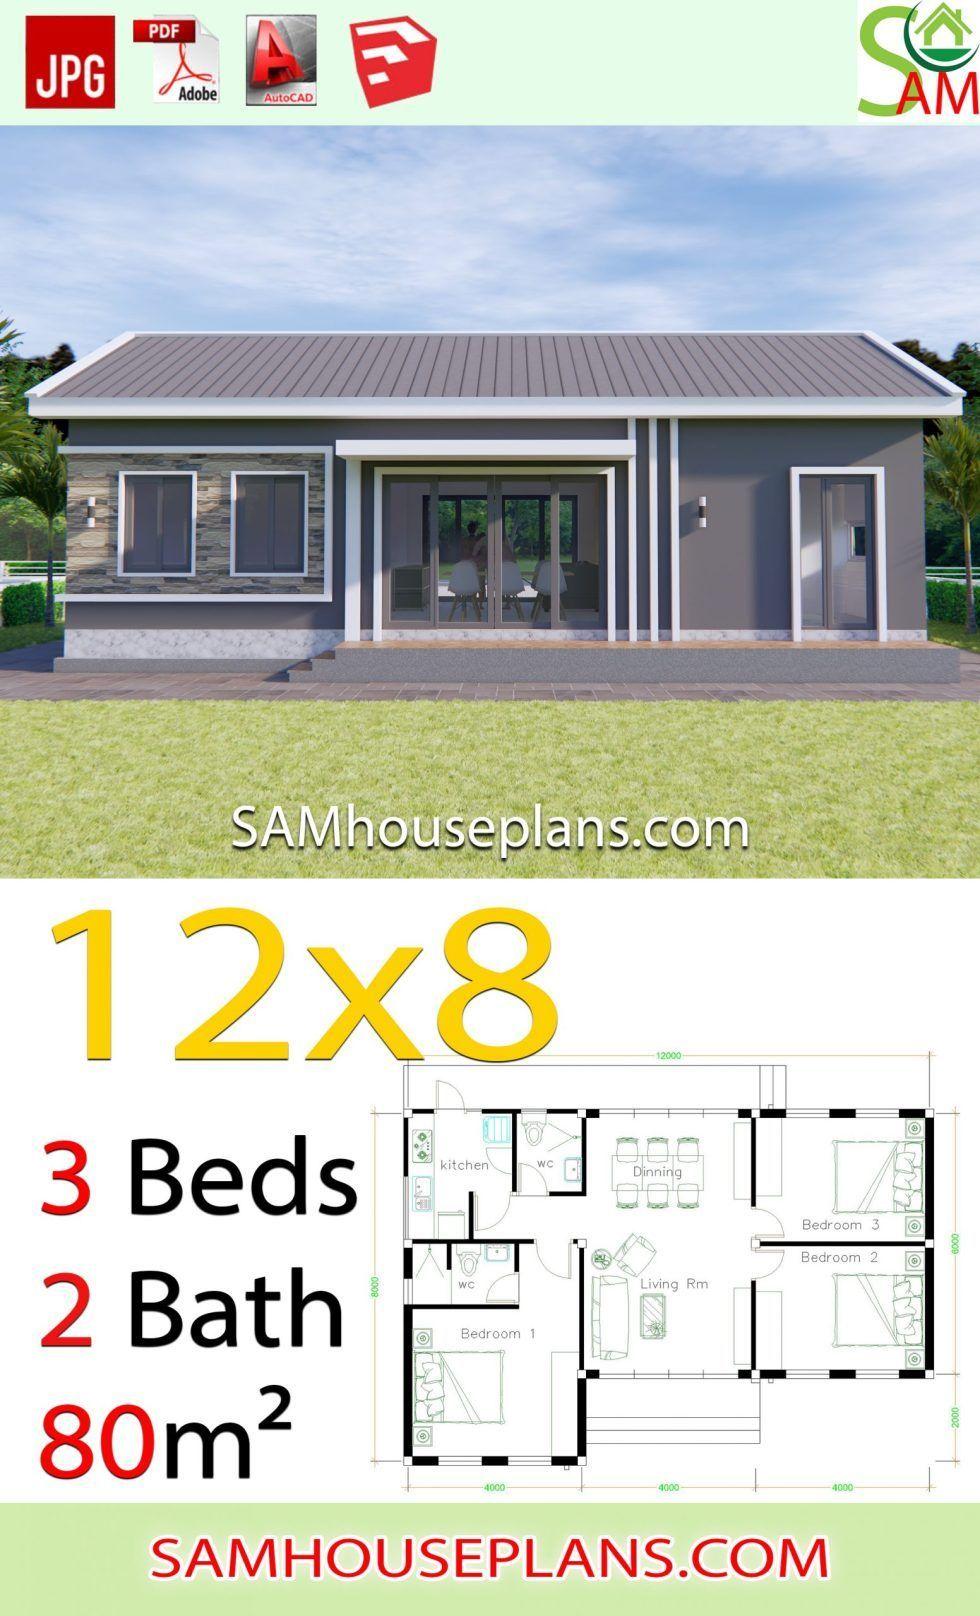 House Plans 12x8 With 3 Bedrooms Gable Roof Sam House Plans 12x8 Bedrooms Gable House Plans Roof Sam Rumah Indah Denah Rumah Rumah